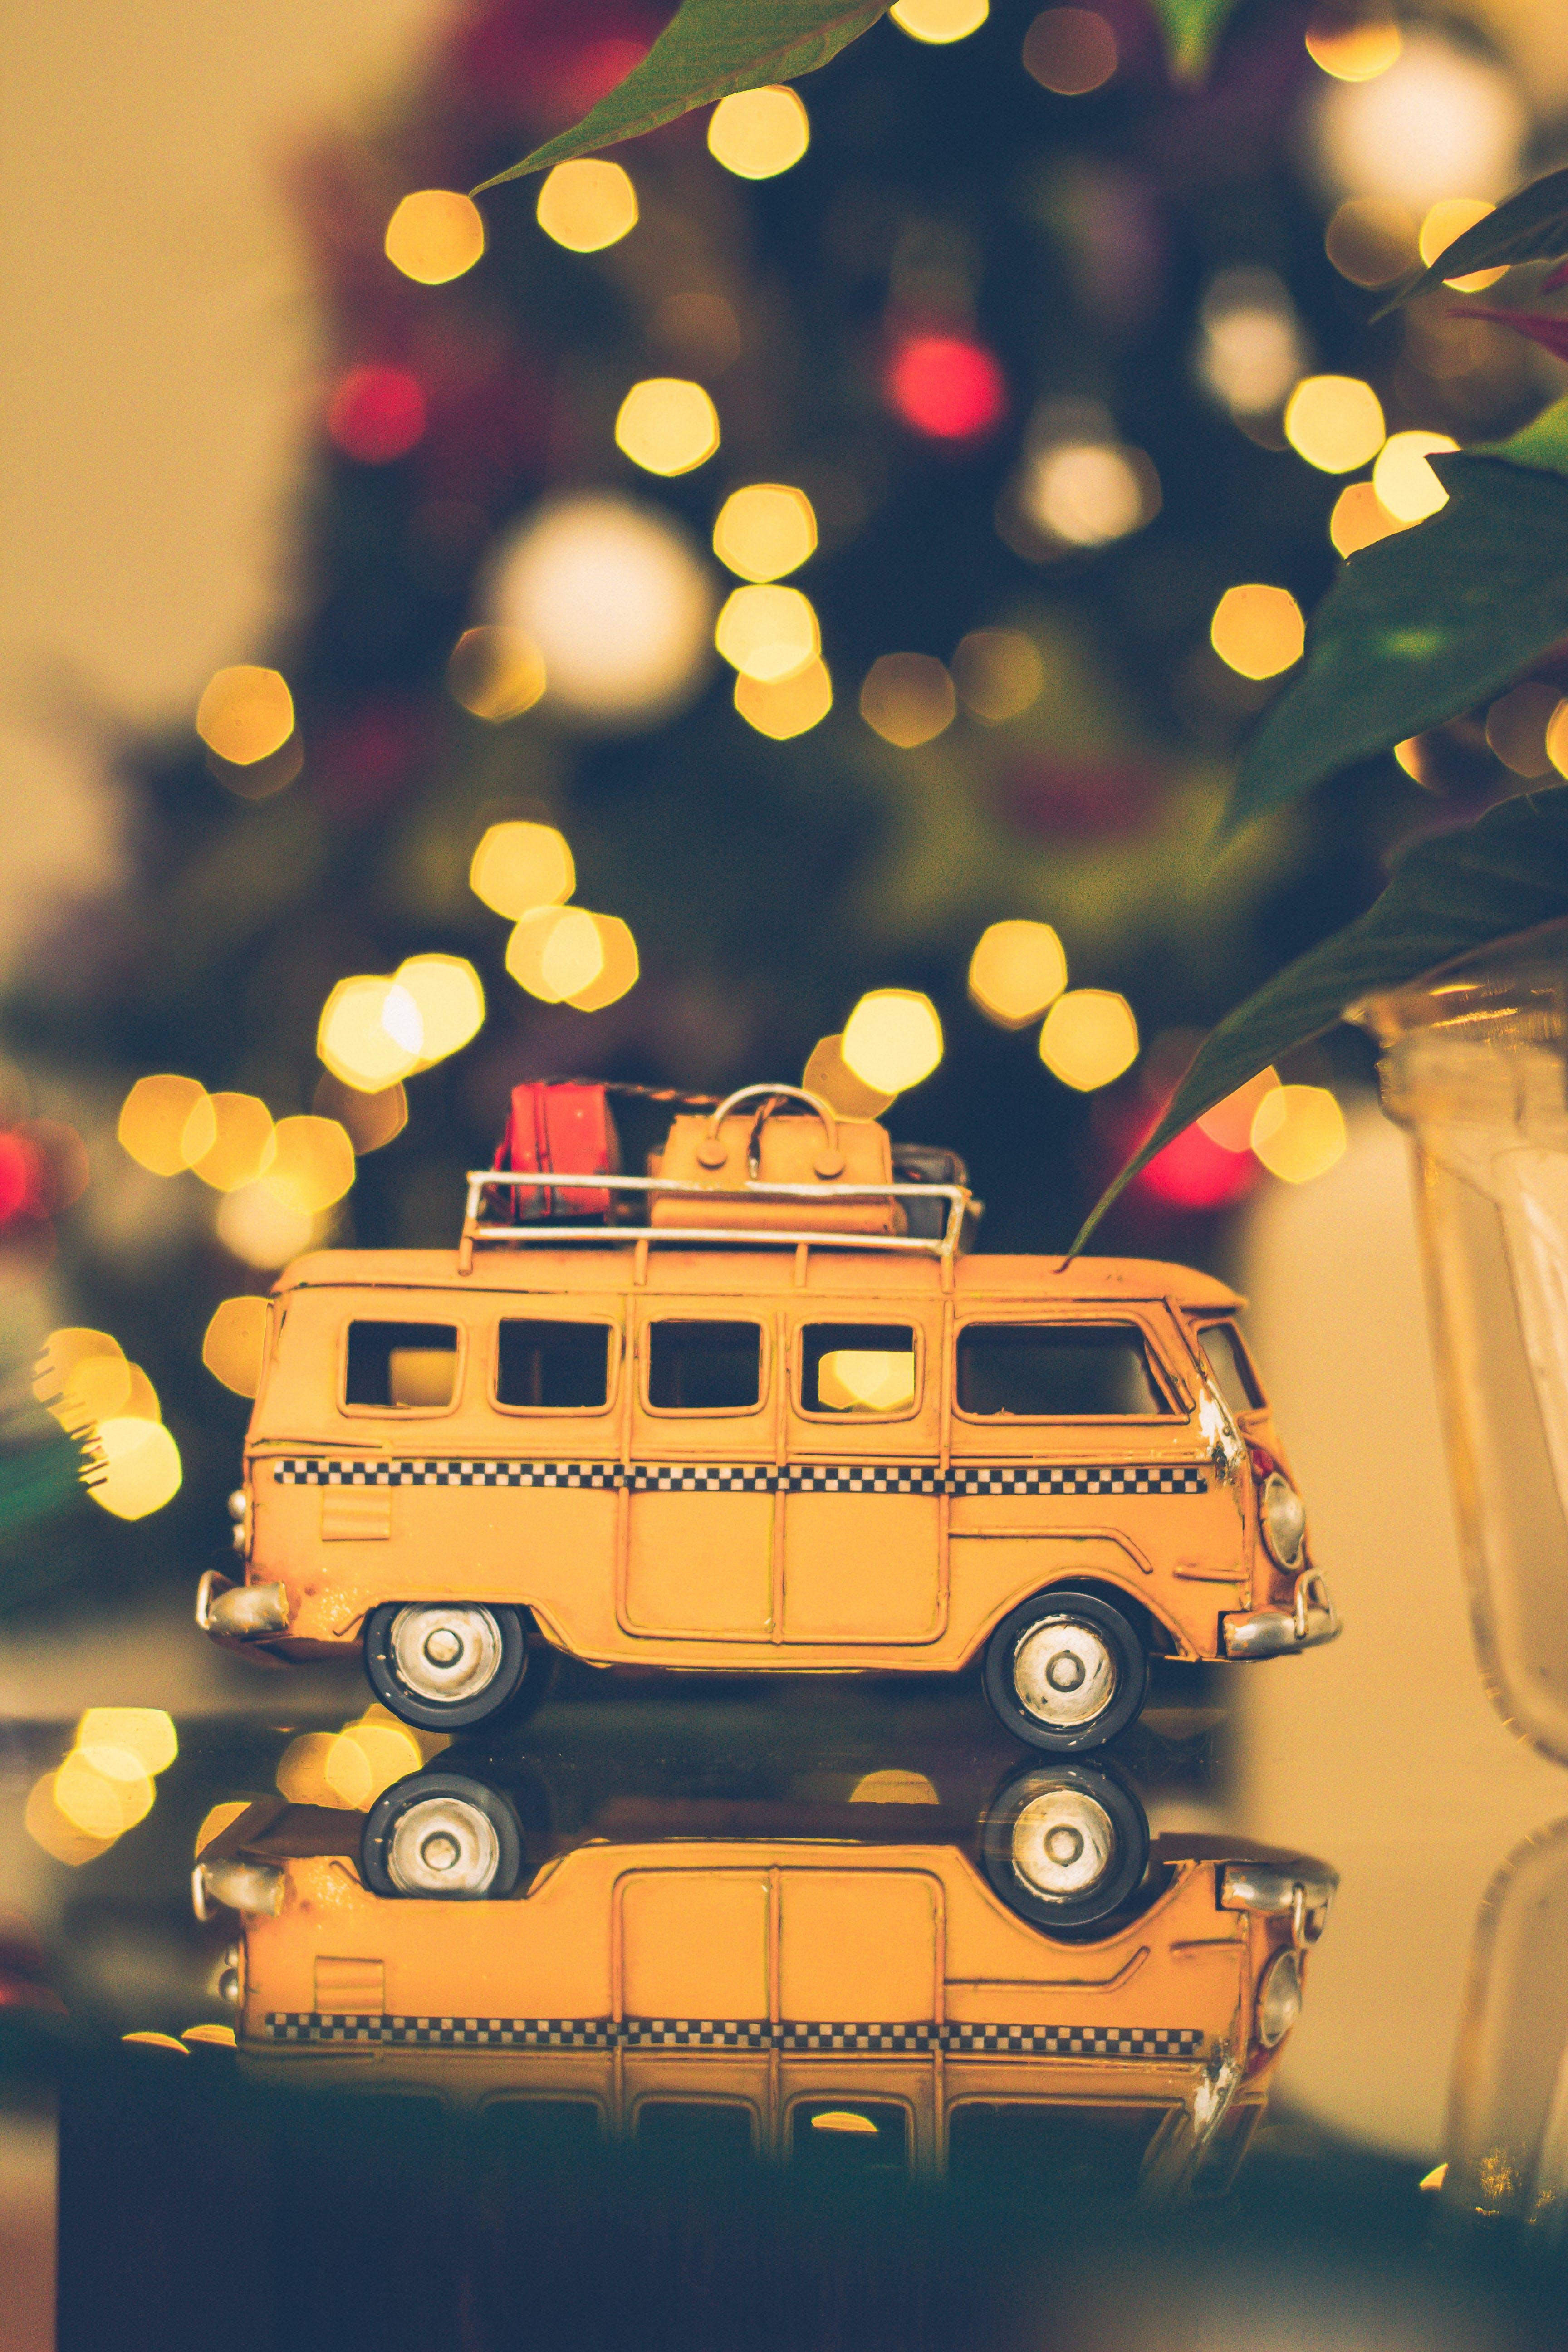 Kostenloses Stock Foto zu auto, baum, beleuchtung, bokeh